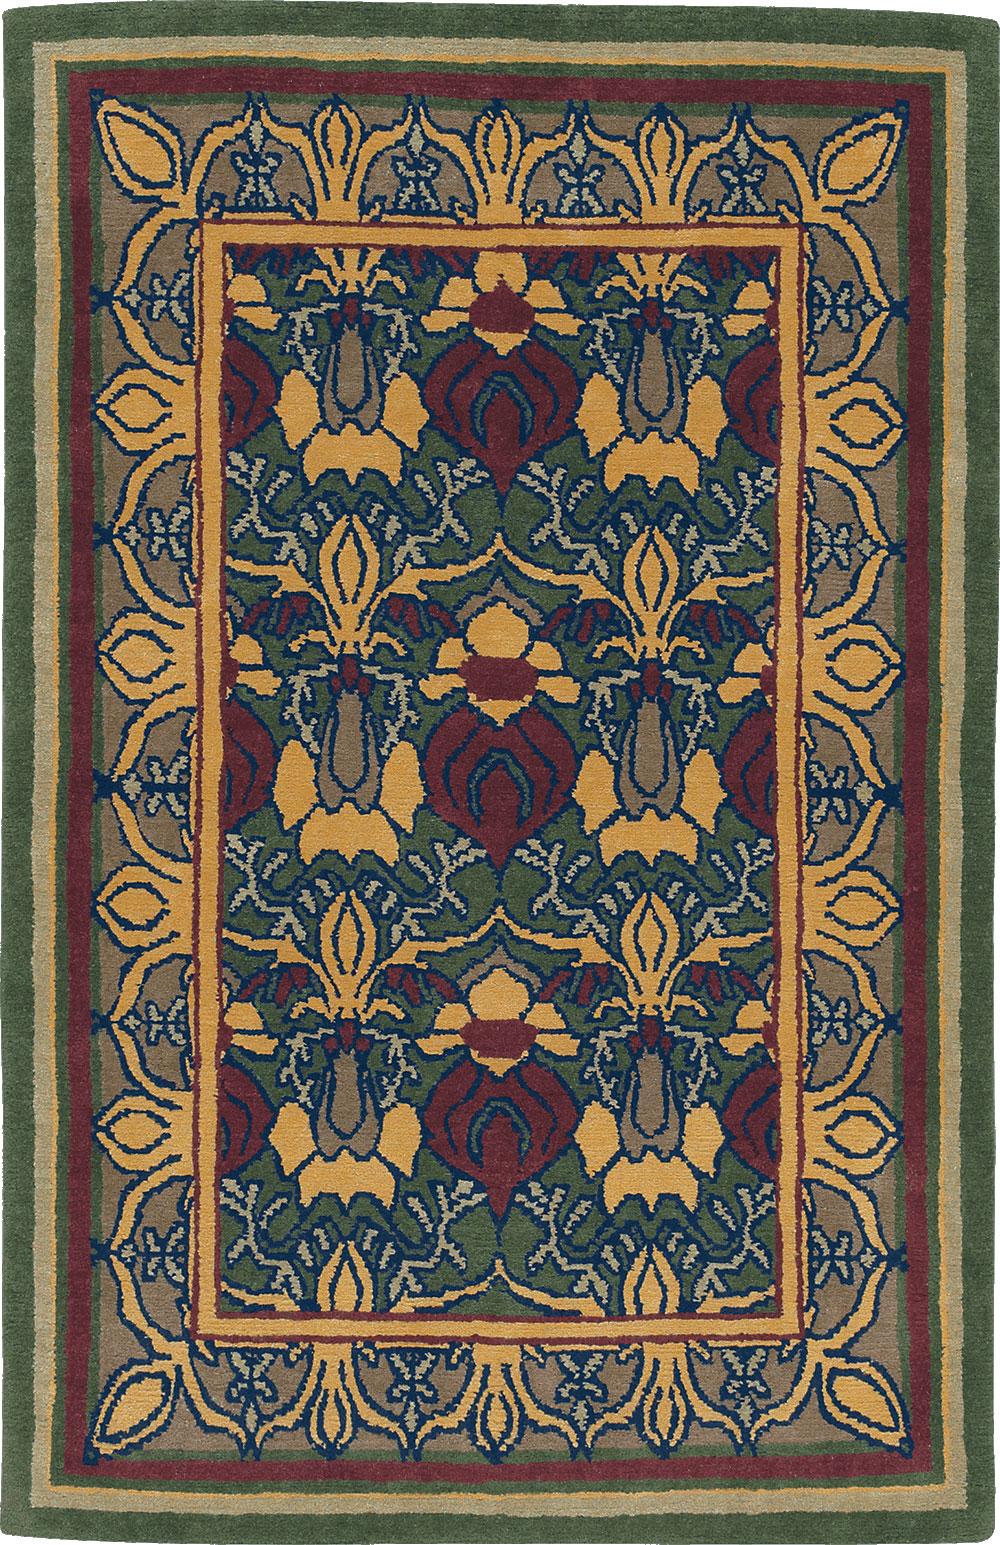 Craftsman Collection Tiger Rug